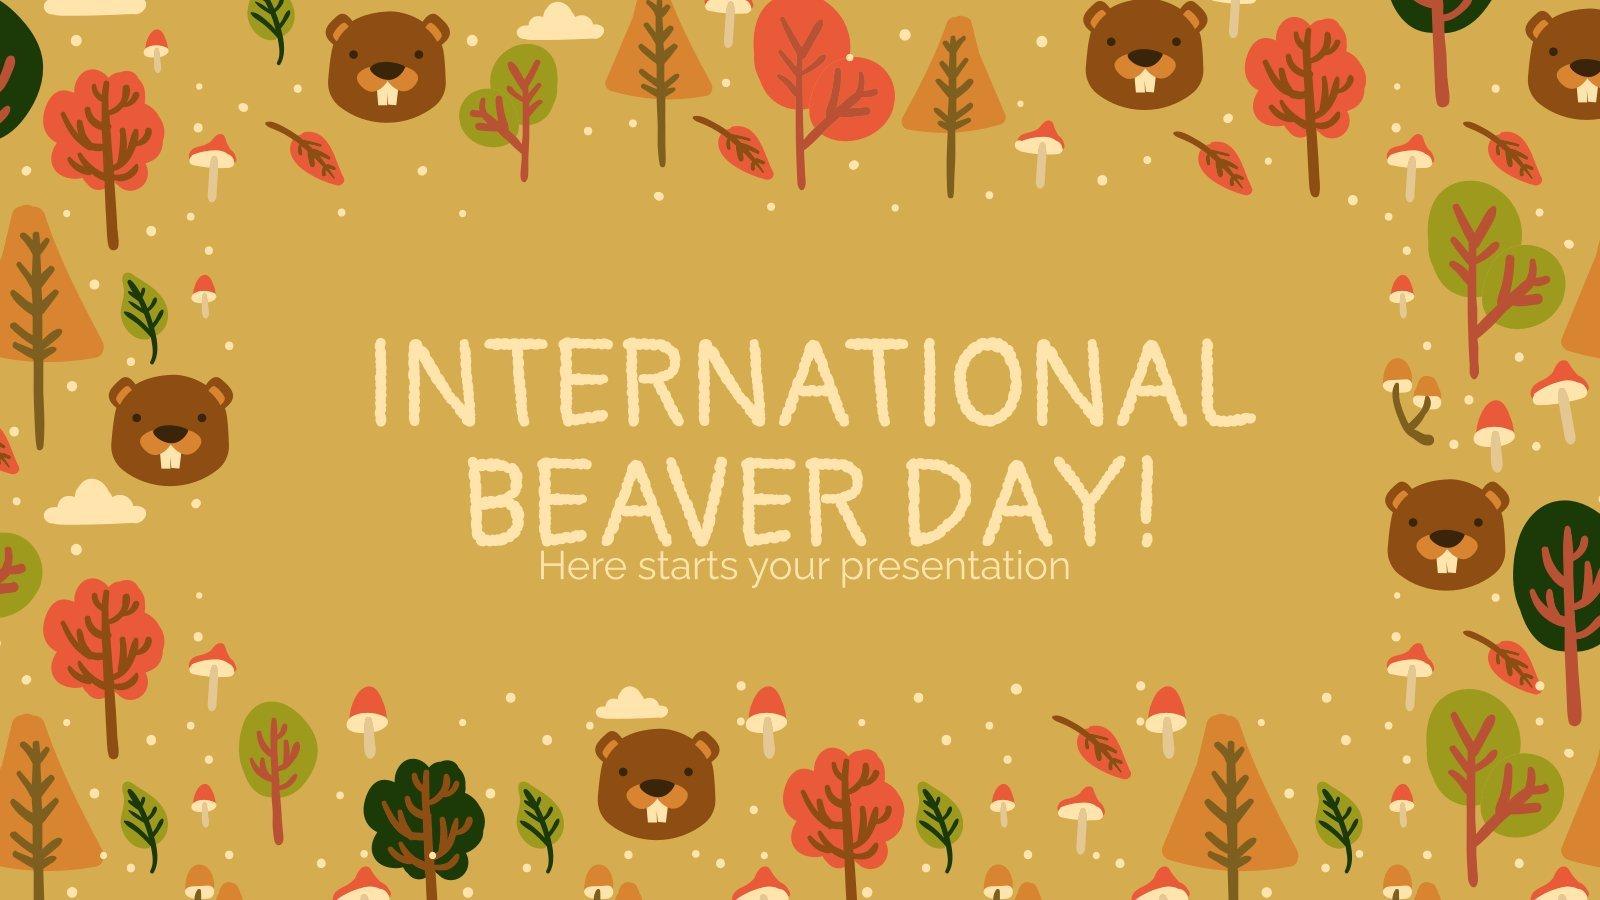 International Beaver Day presentation template